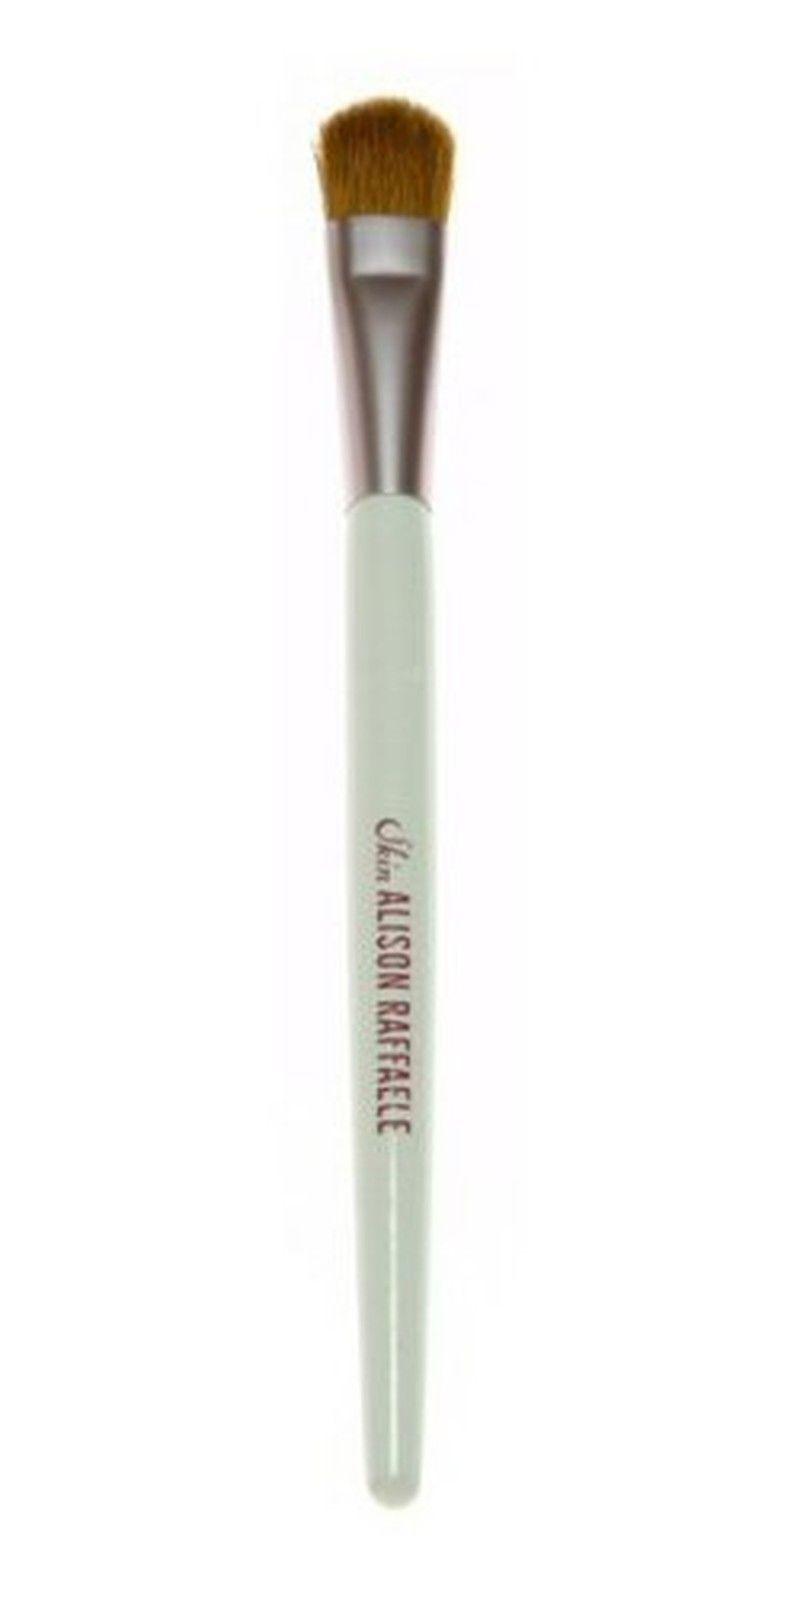 Alison Raffaele Flat Eyeshadow Brush - $23.80